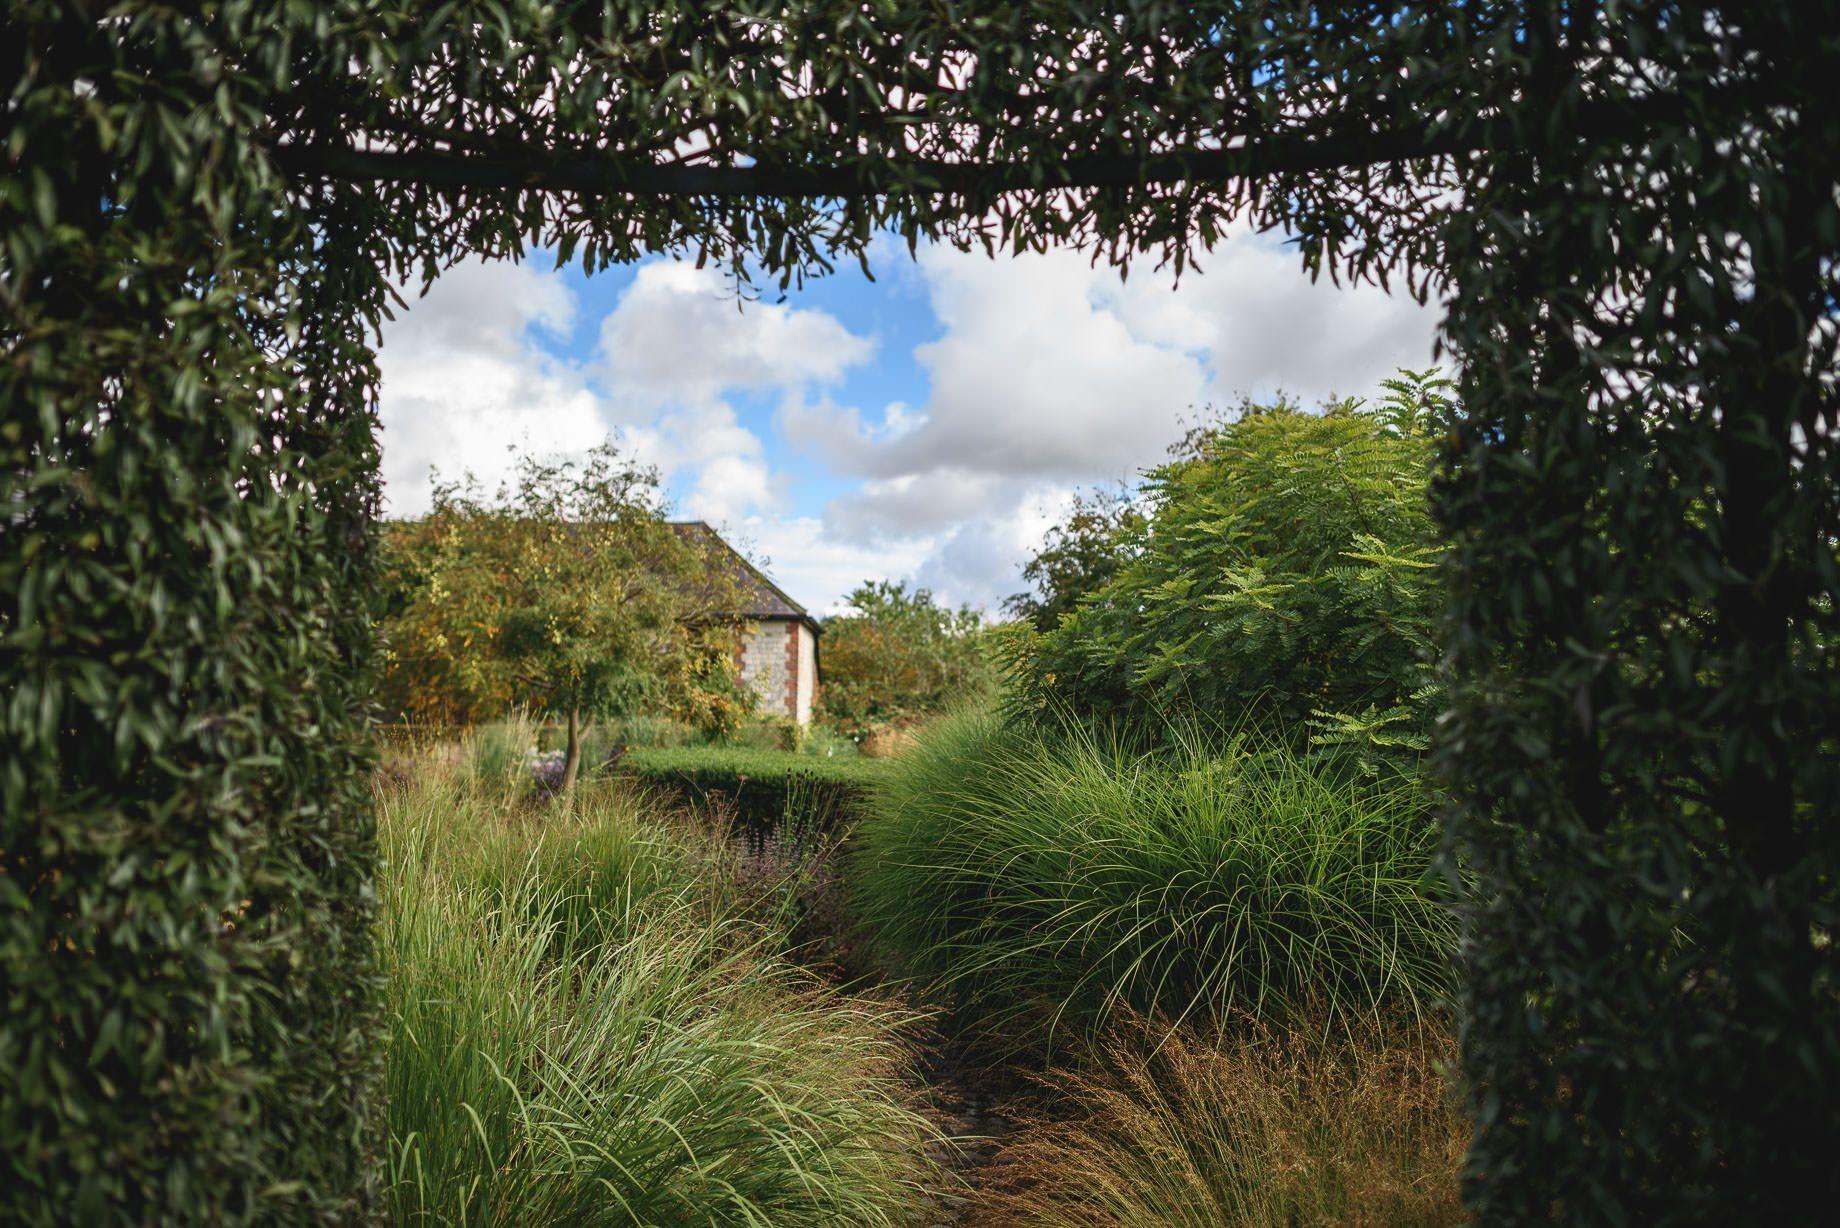 bury-court-barn-wedding-photography-guy-collier-photography-nadia-tom-1-of-184